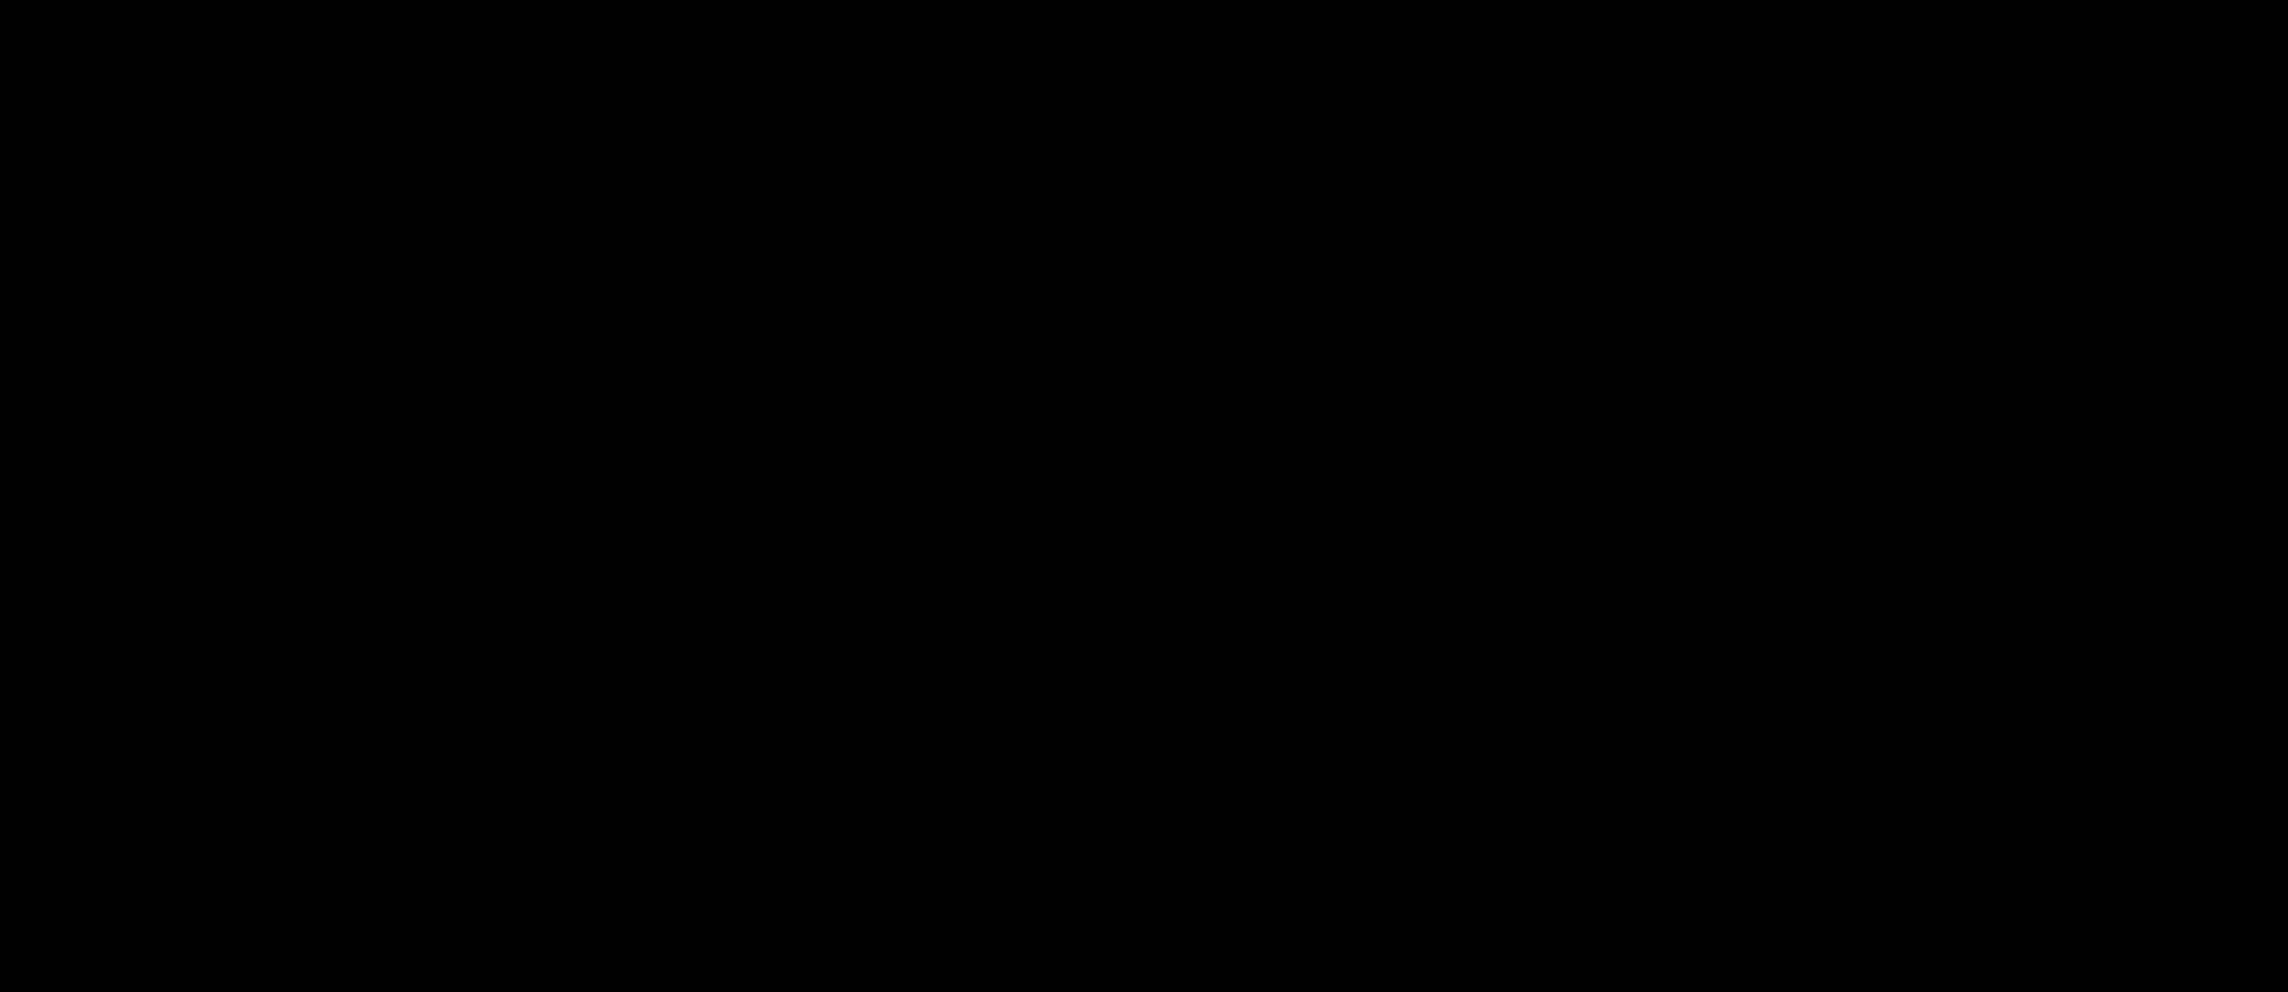 3-Dansyl-<sup>13</sup>C<sub>2 </sub>estradiol-d<sub>3</sub>